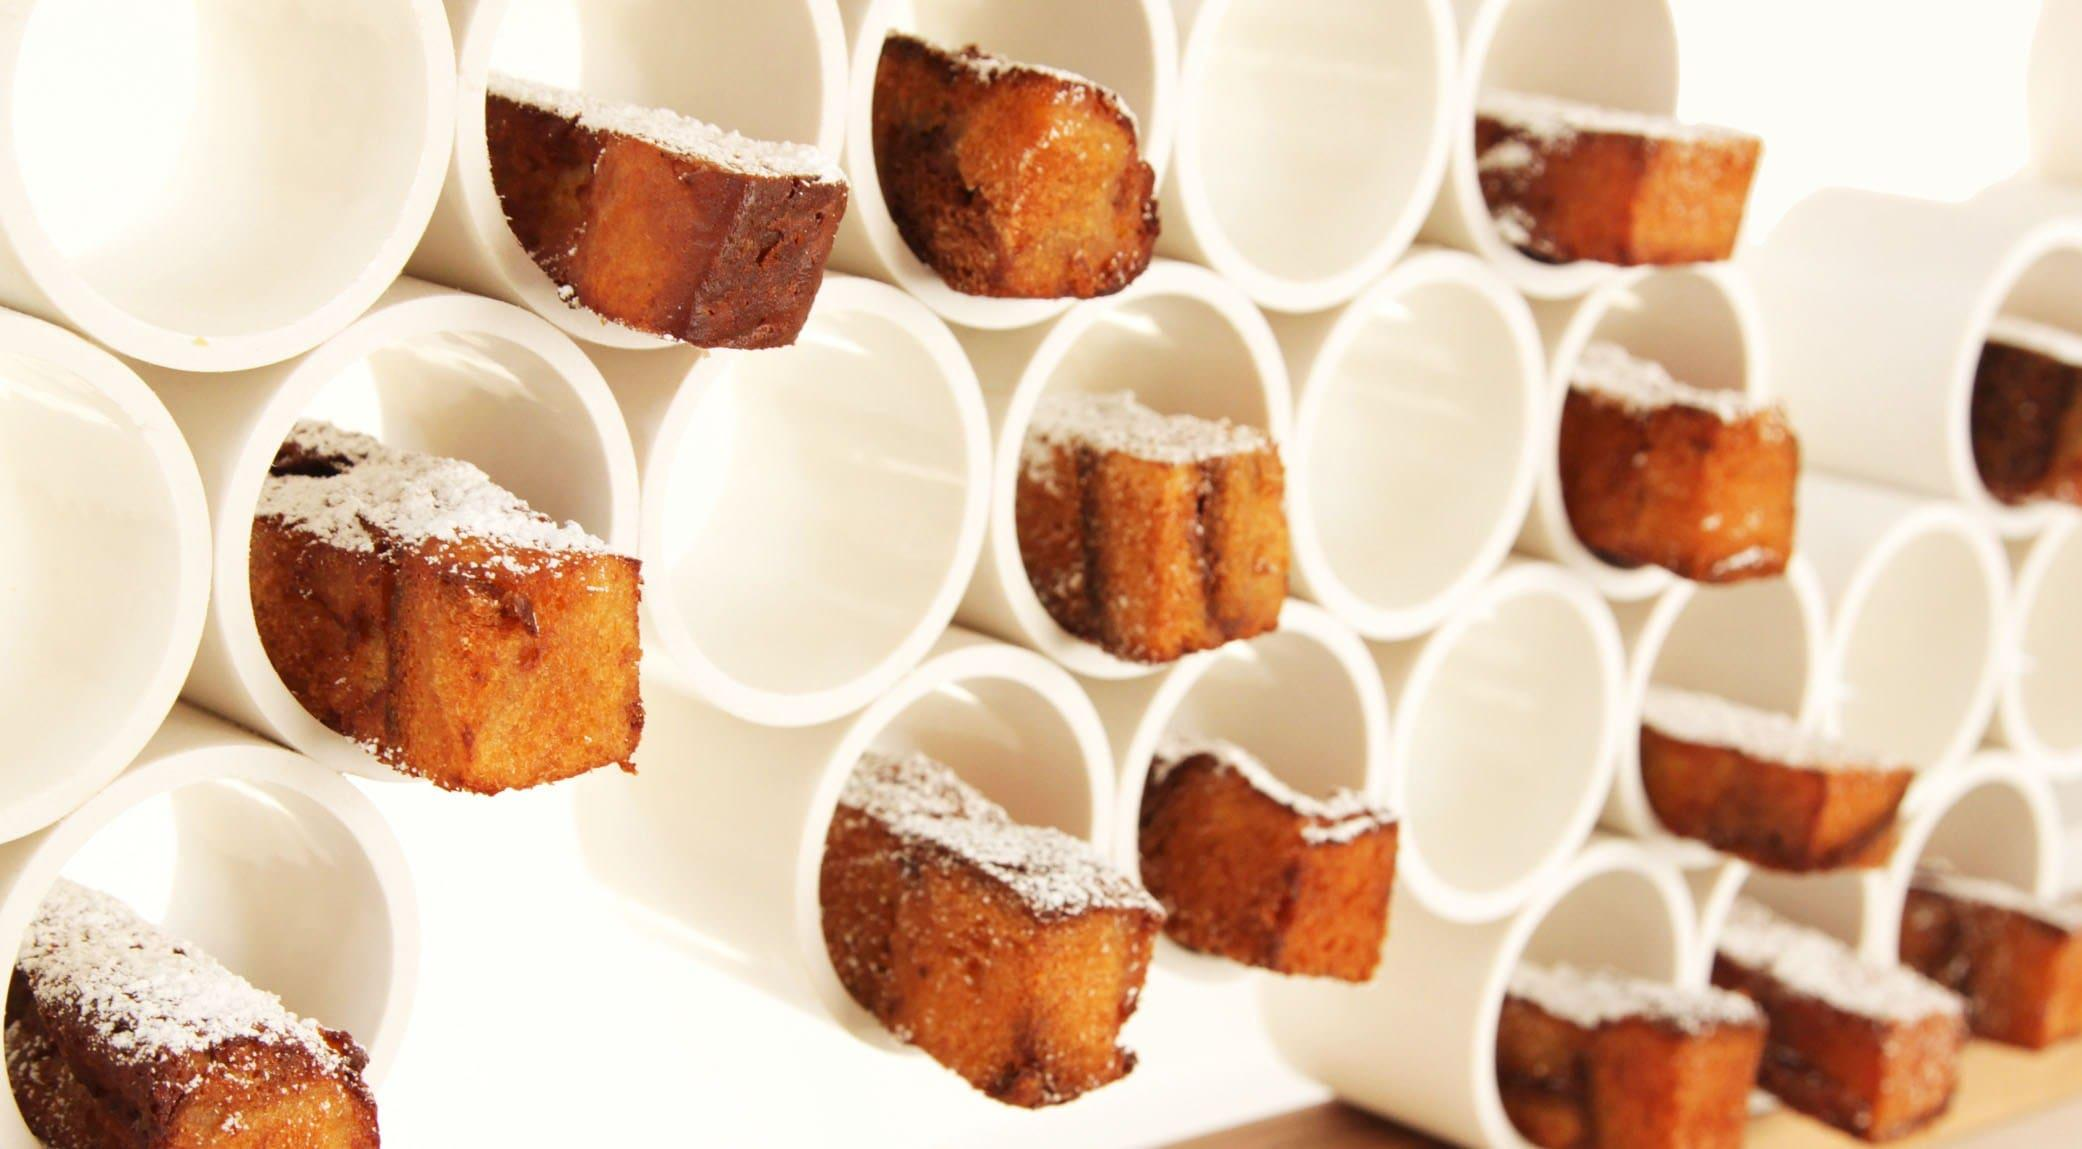 original_PopUp-Holesome-BreadPudding.jpg